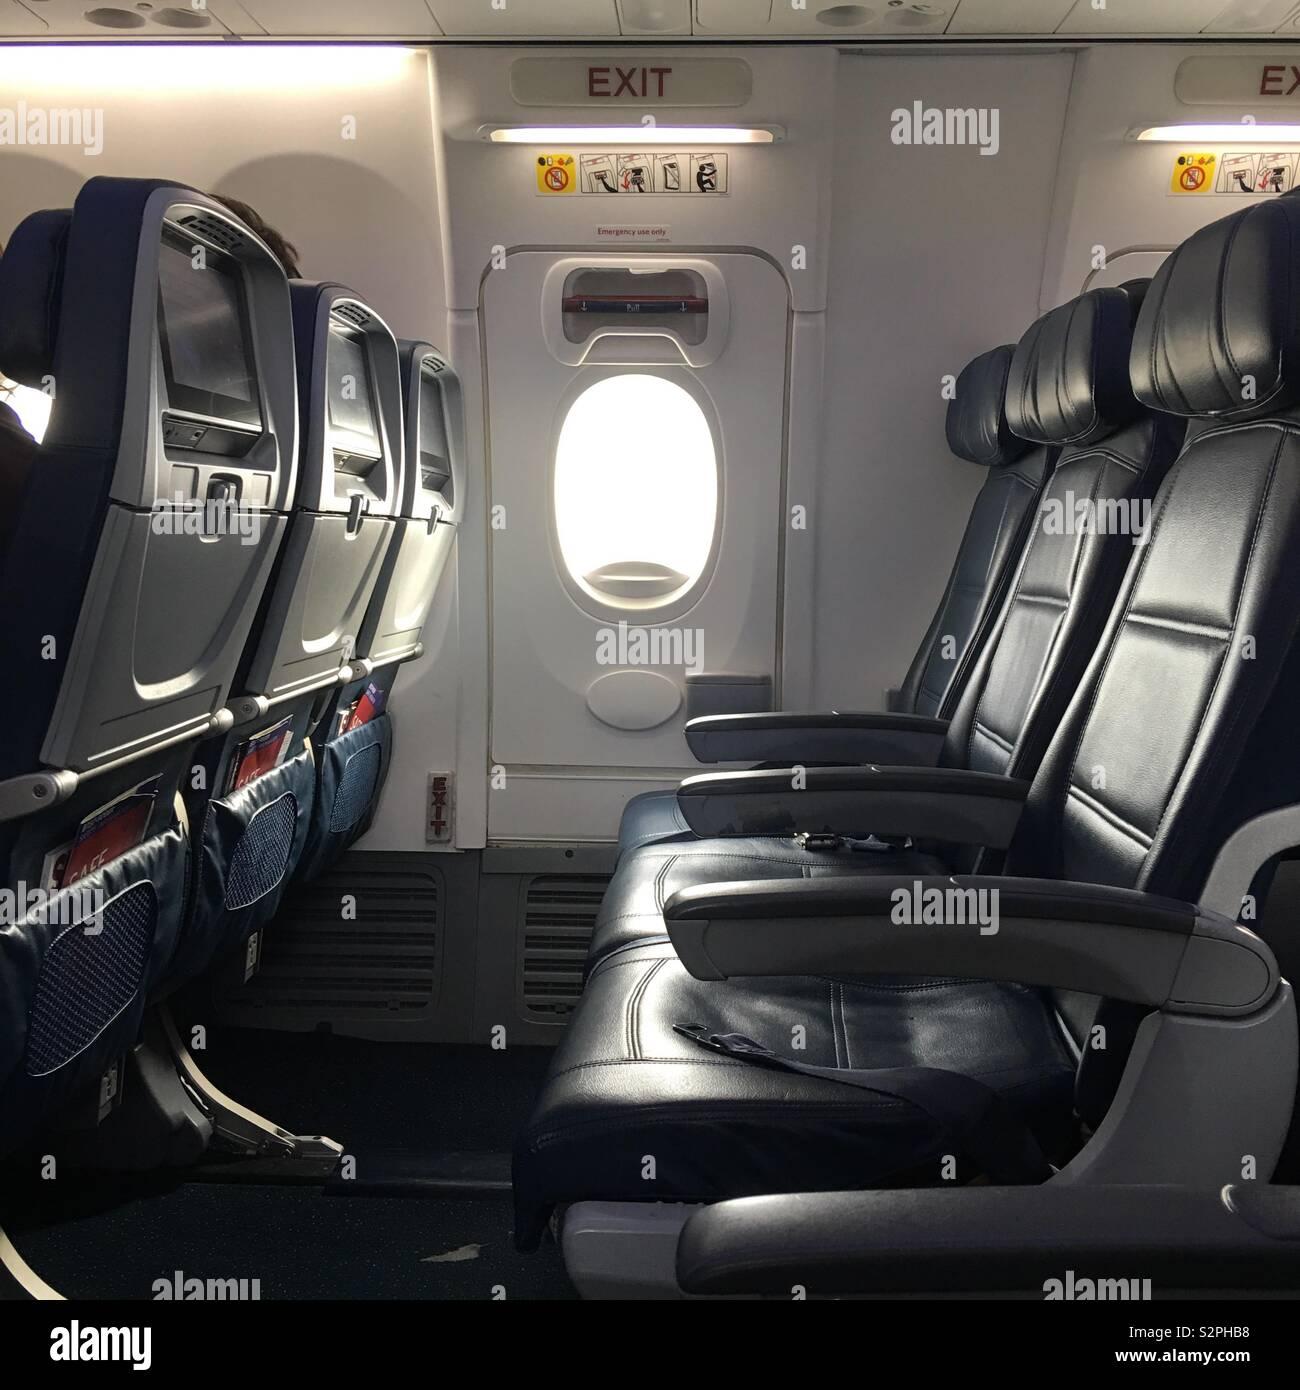 Boeing Interior Seats Stockfotos Boeing Interior Seats